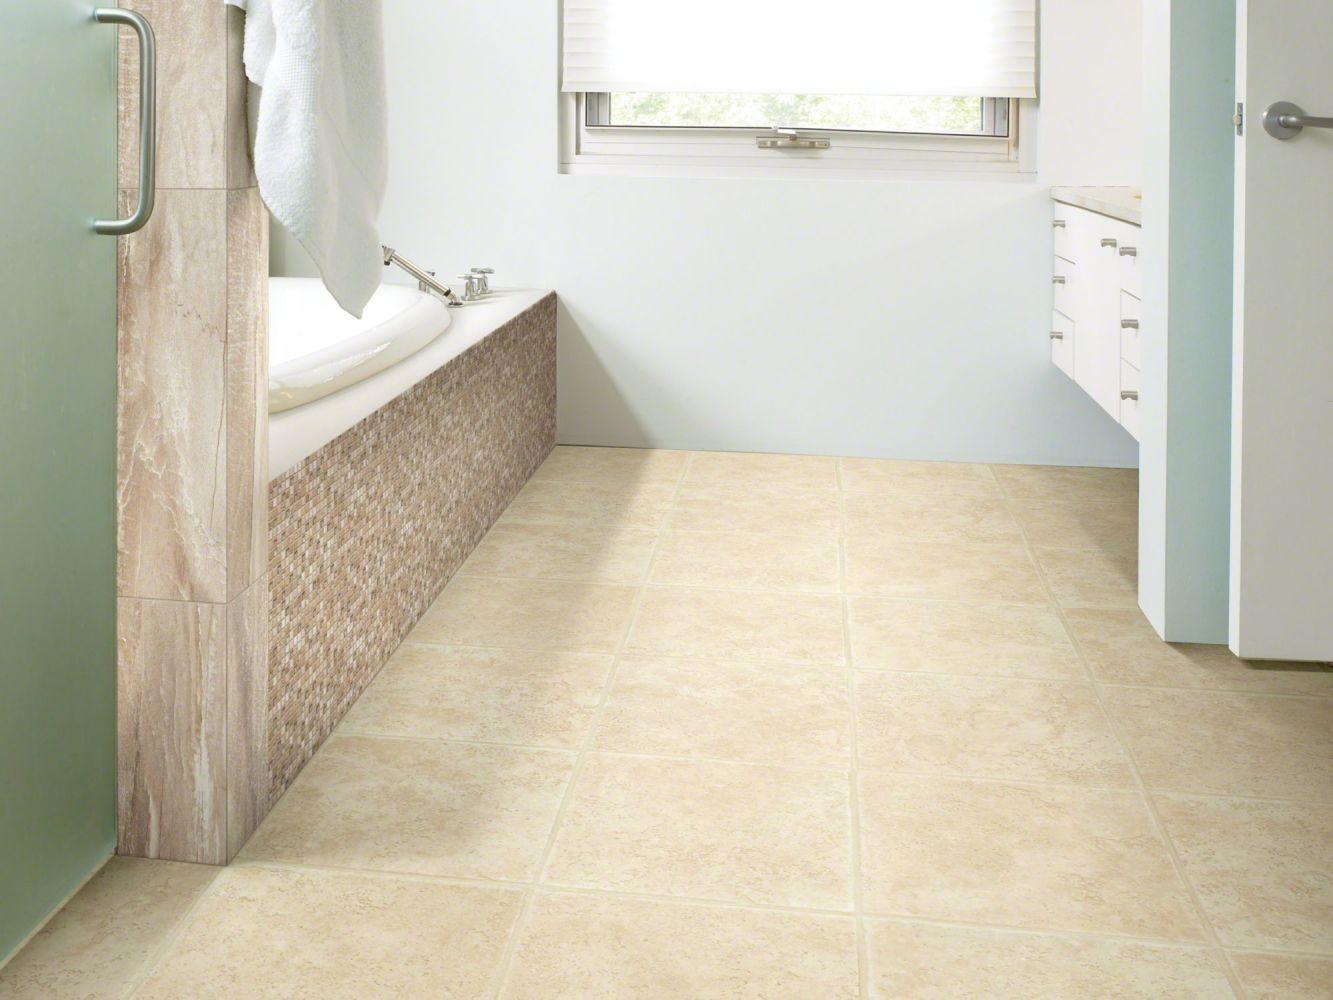 Shaw Floors Resilient Residential Tallon Facet 00133_AR615